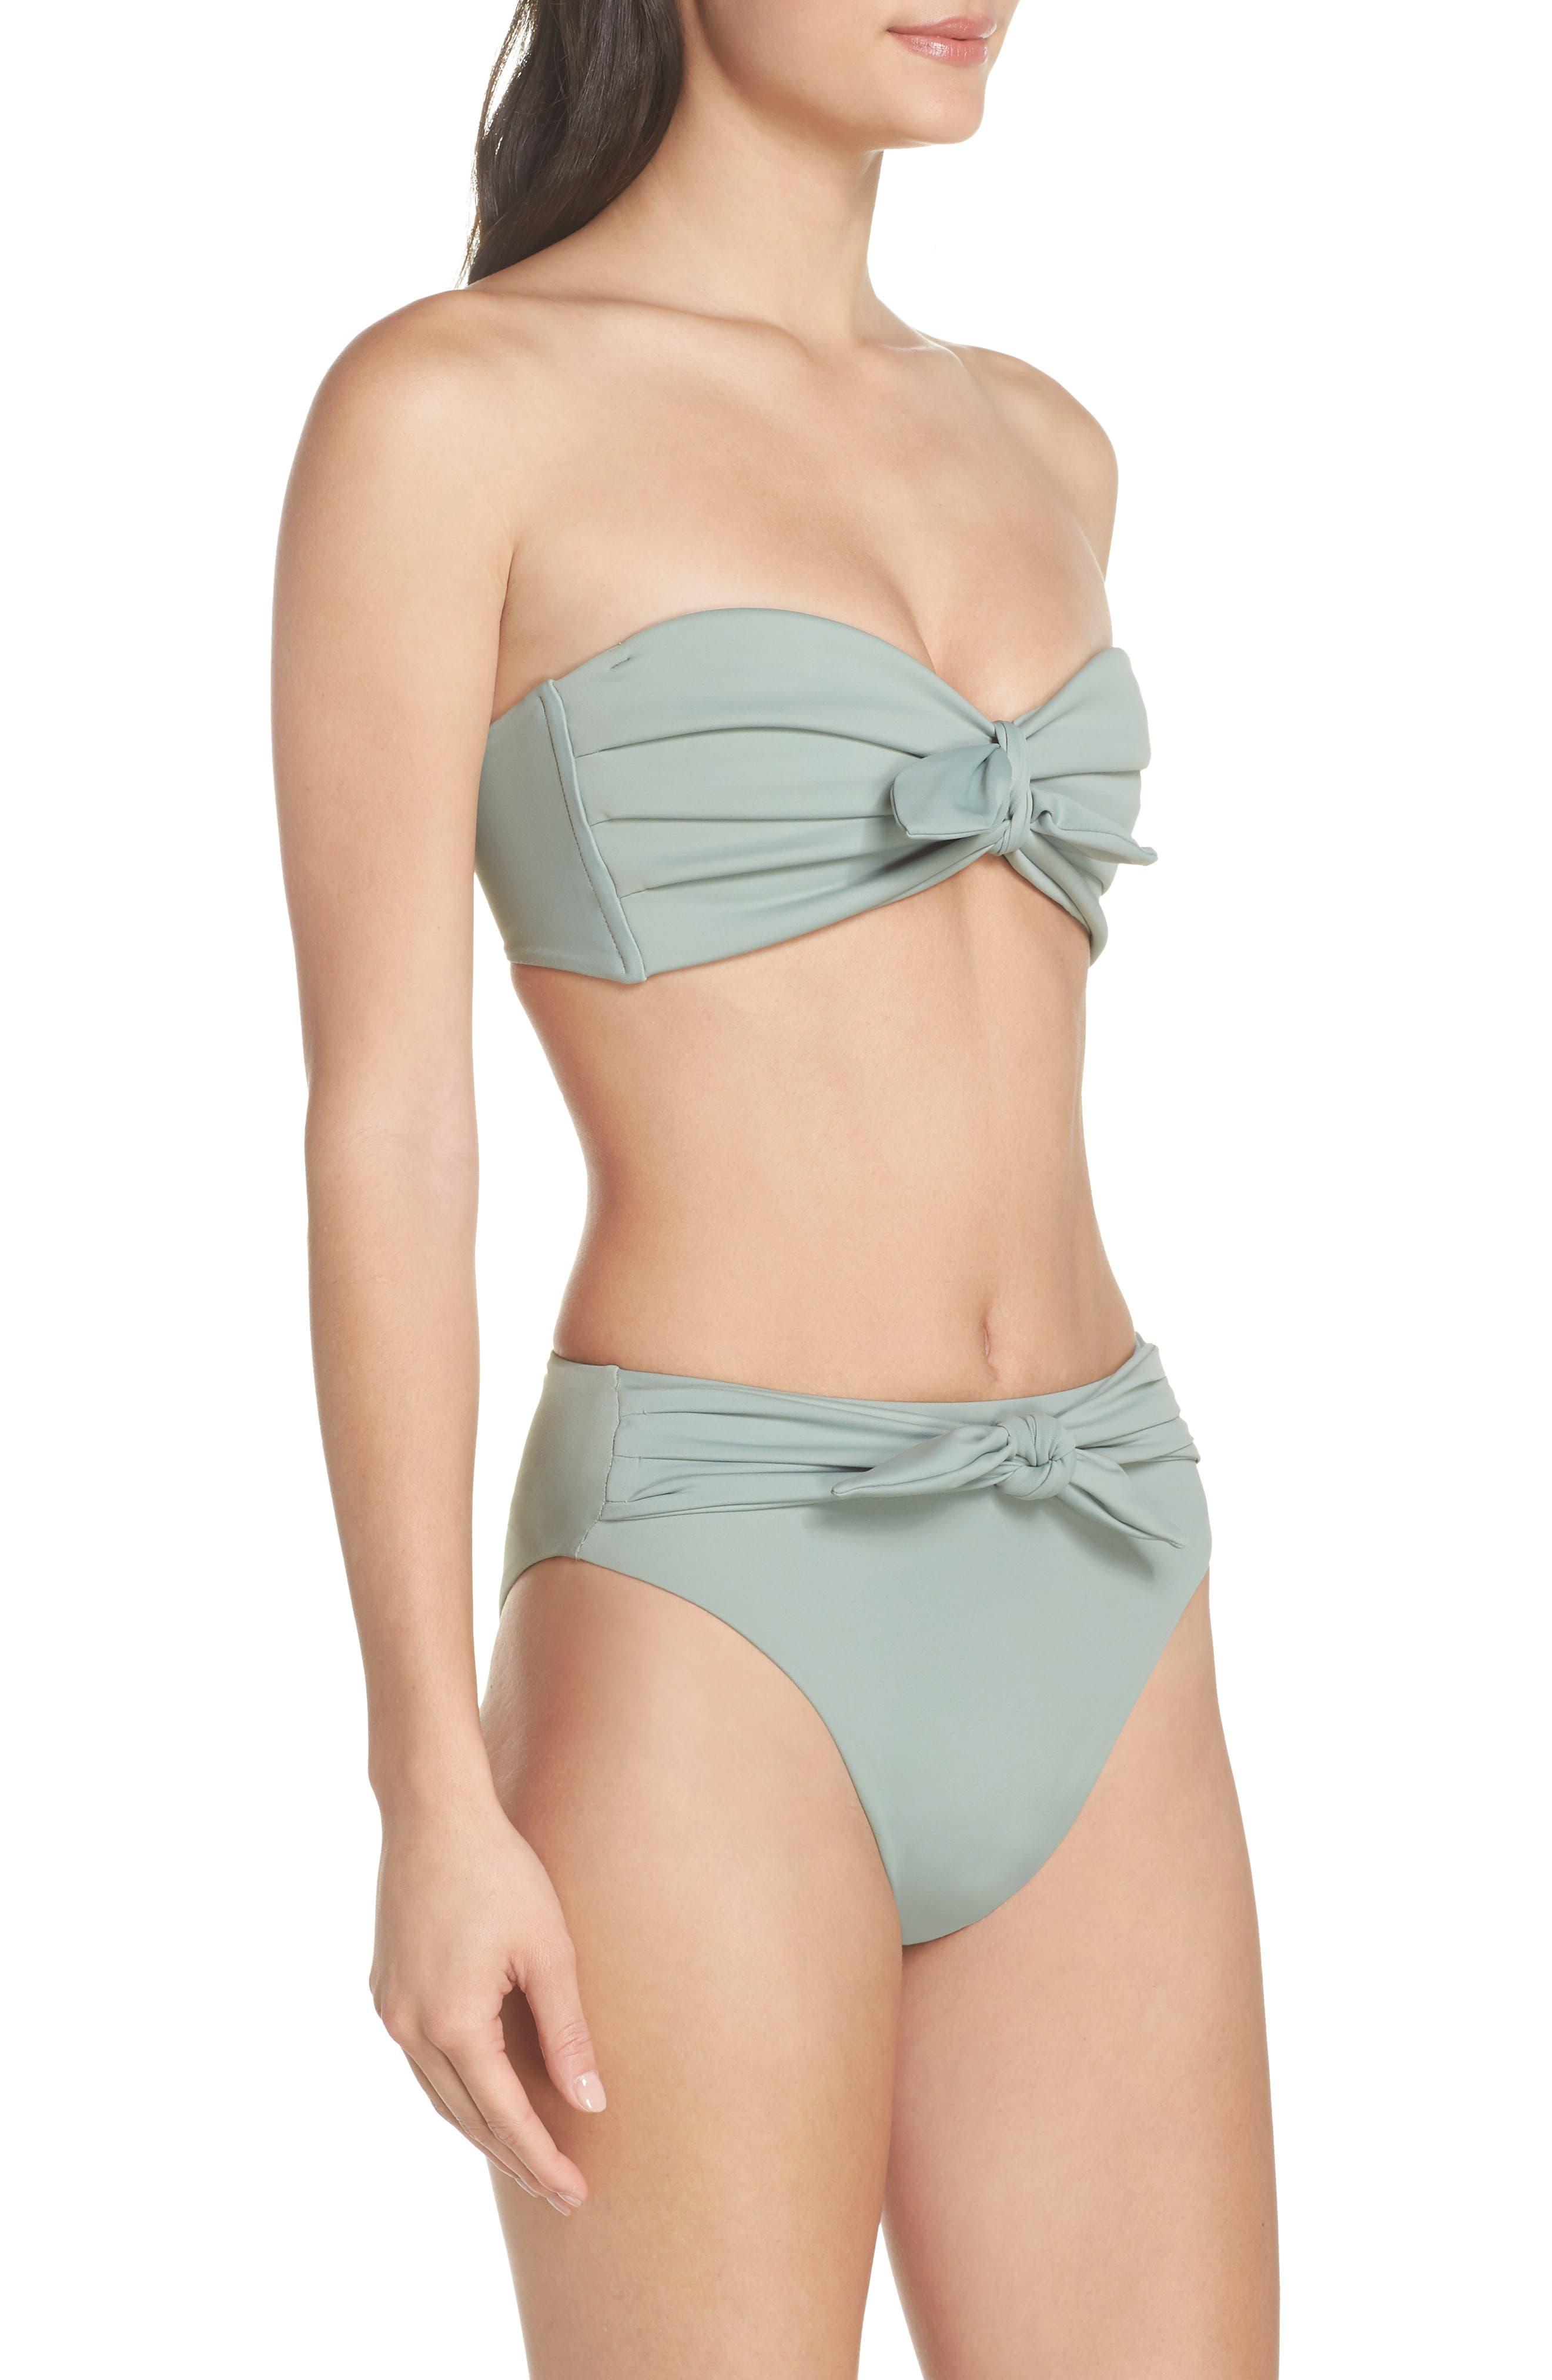 Cabana Bikini Top,                             Alternate thumbnail 10, color,                             PISTACHE GREEN